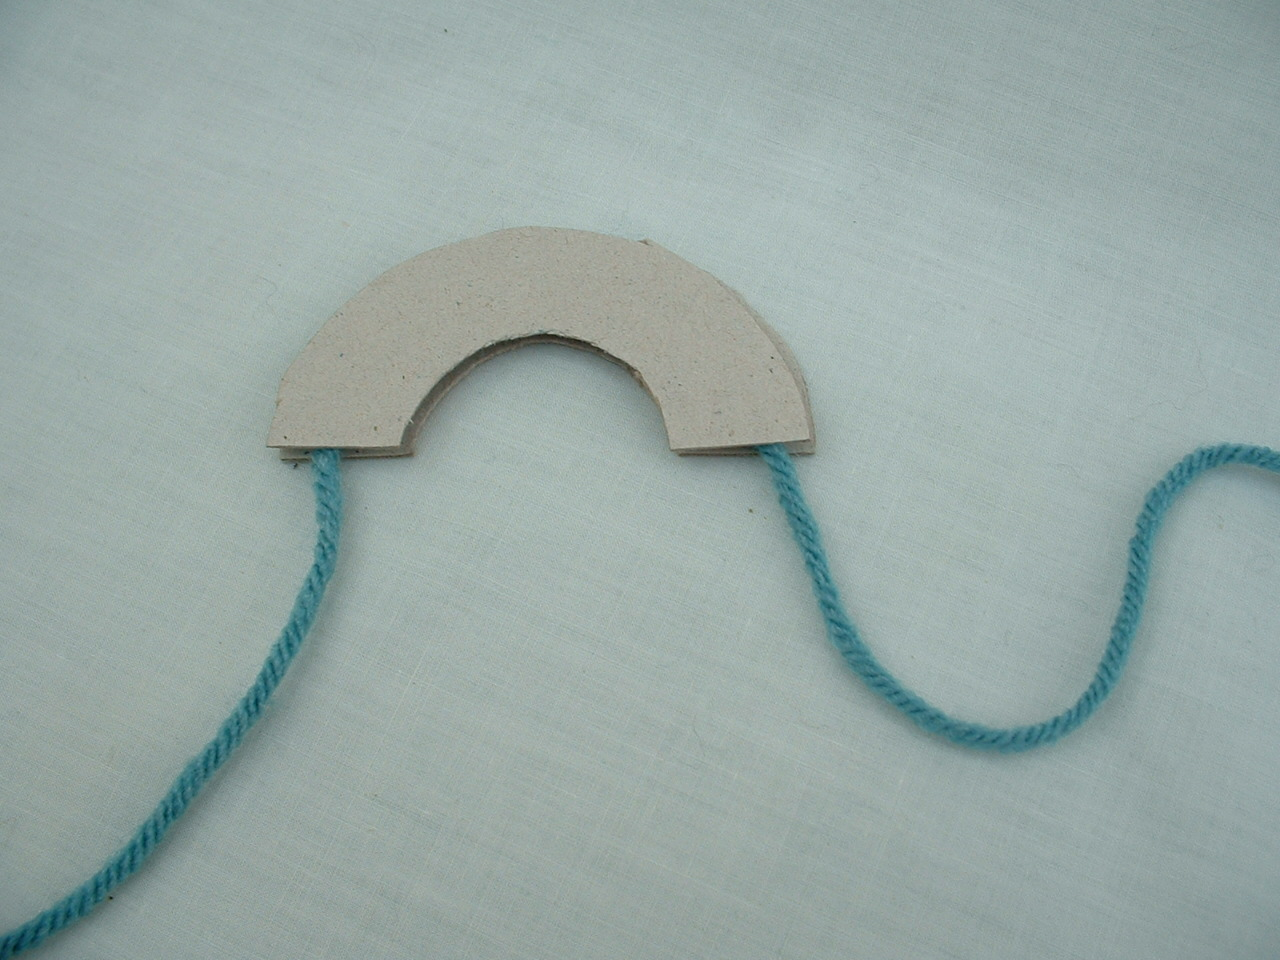 how to make a pom pom with cardboard circle